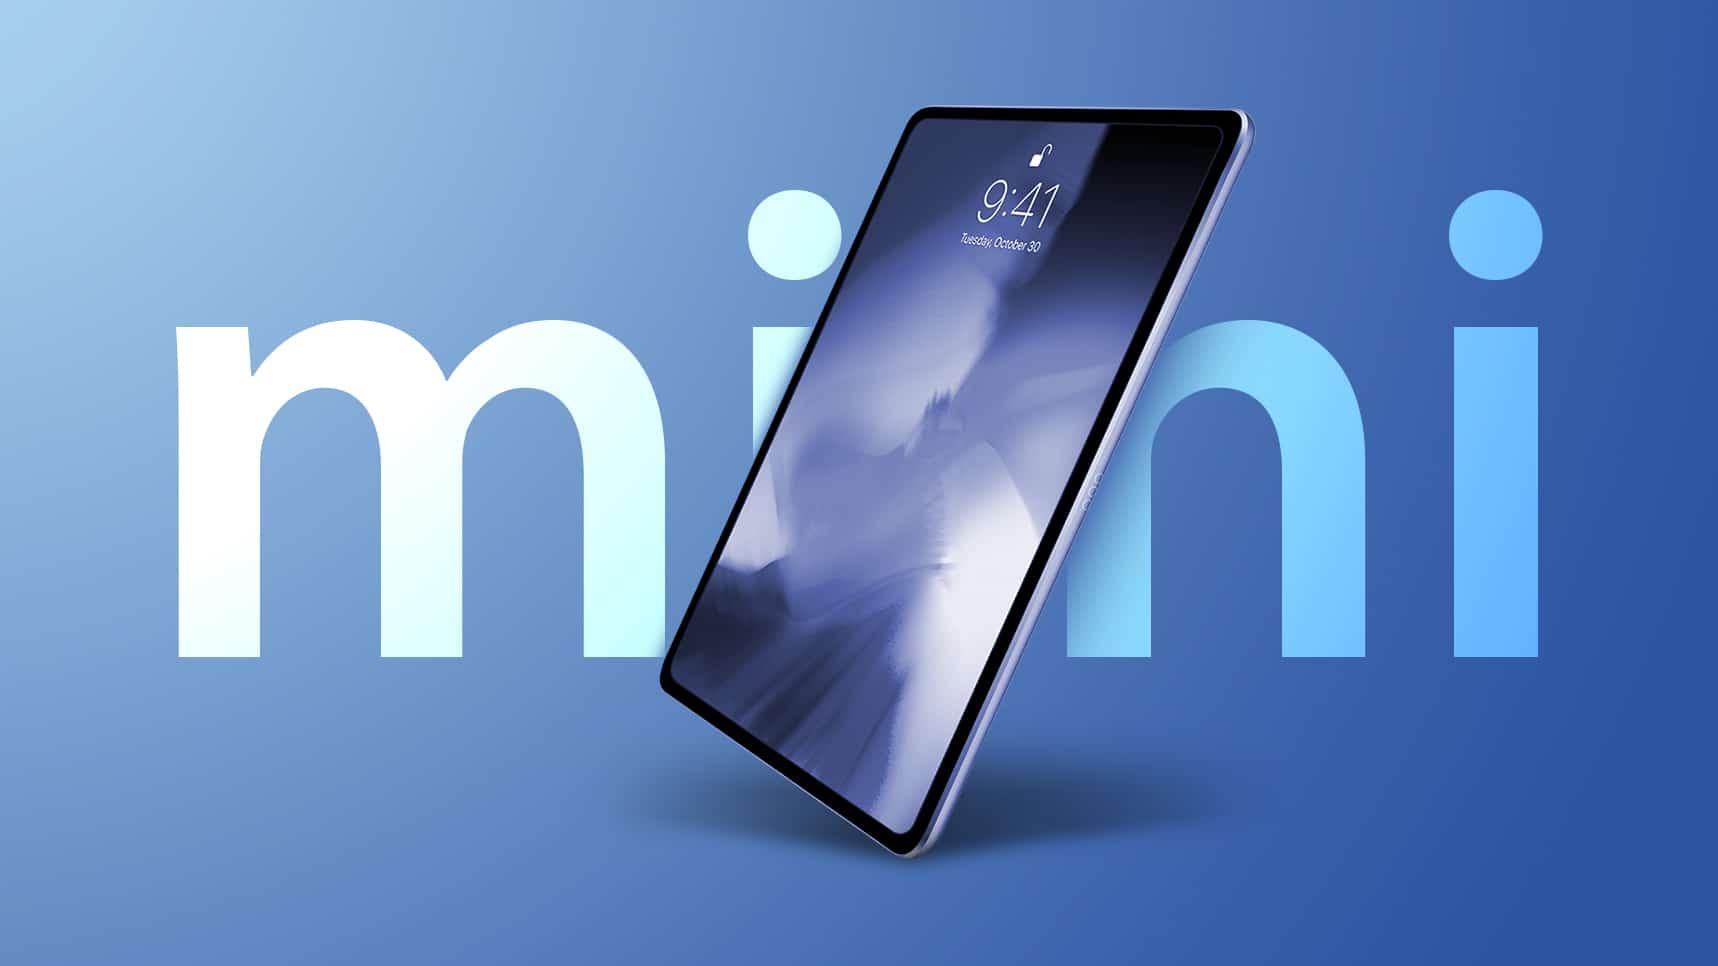 iPad mini 6 อาจจะมาพร้อมดีไซน์ใหม่กับชิป A15